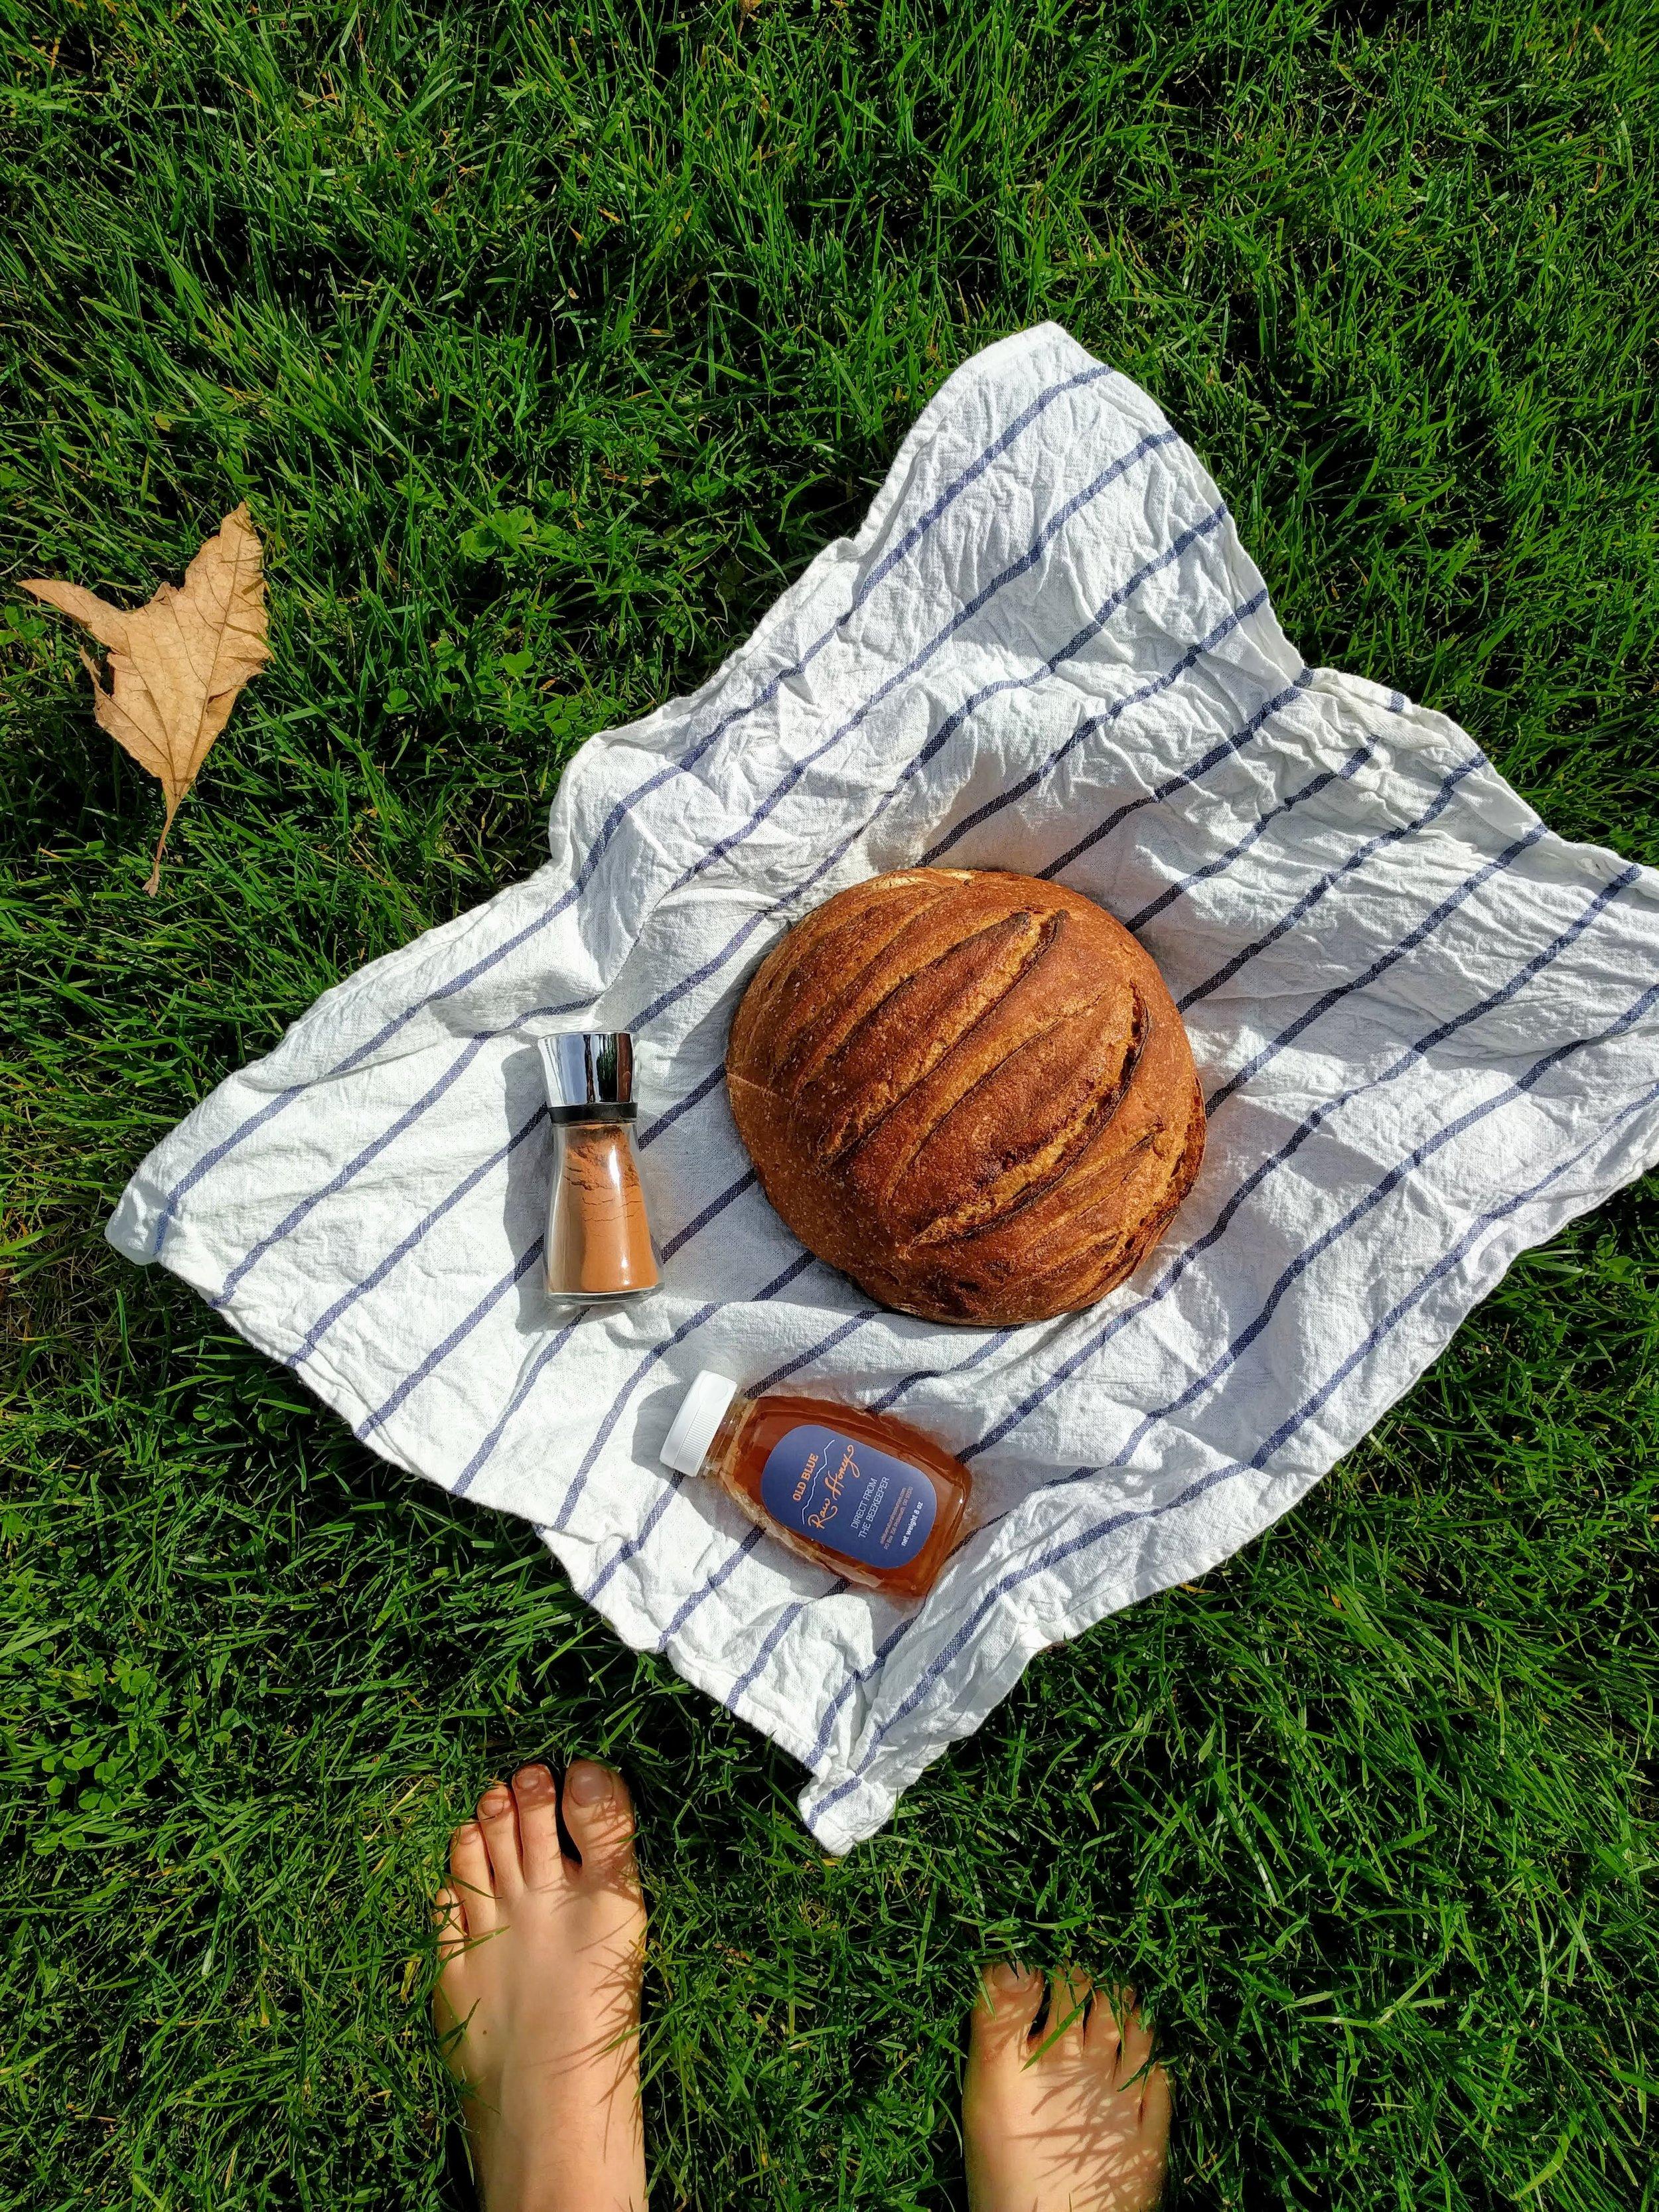 Cinnamon Toast Kit from Thousand Bites of Bread